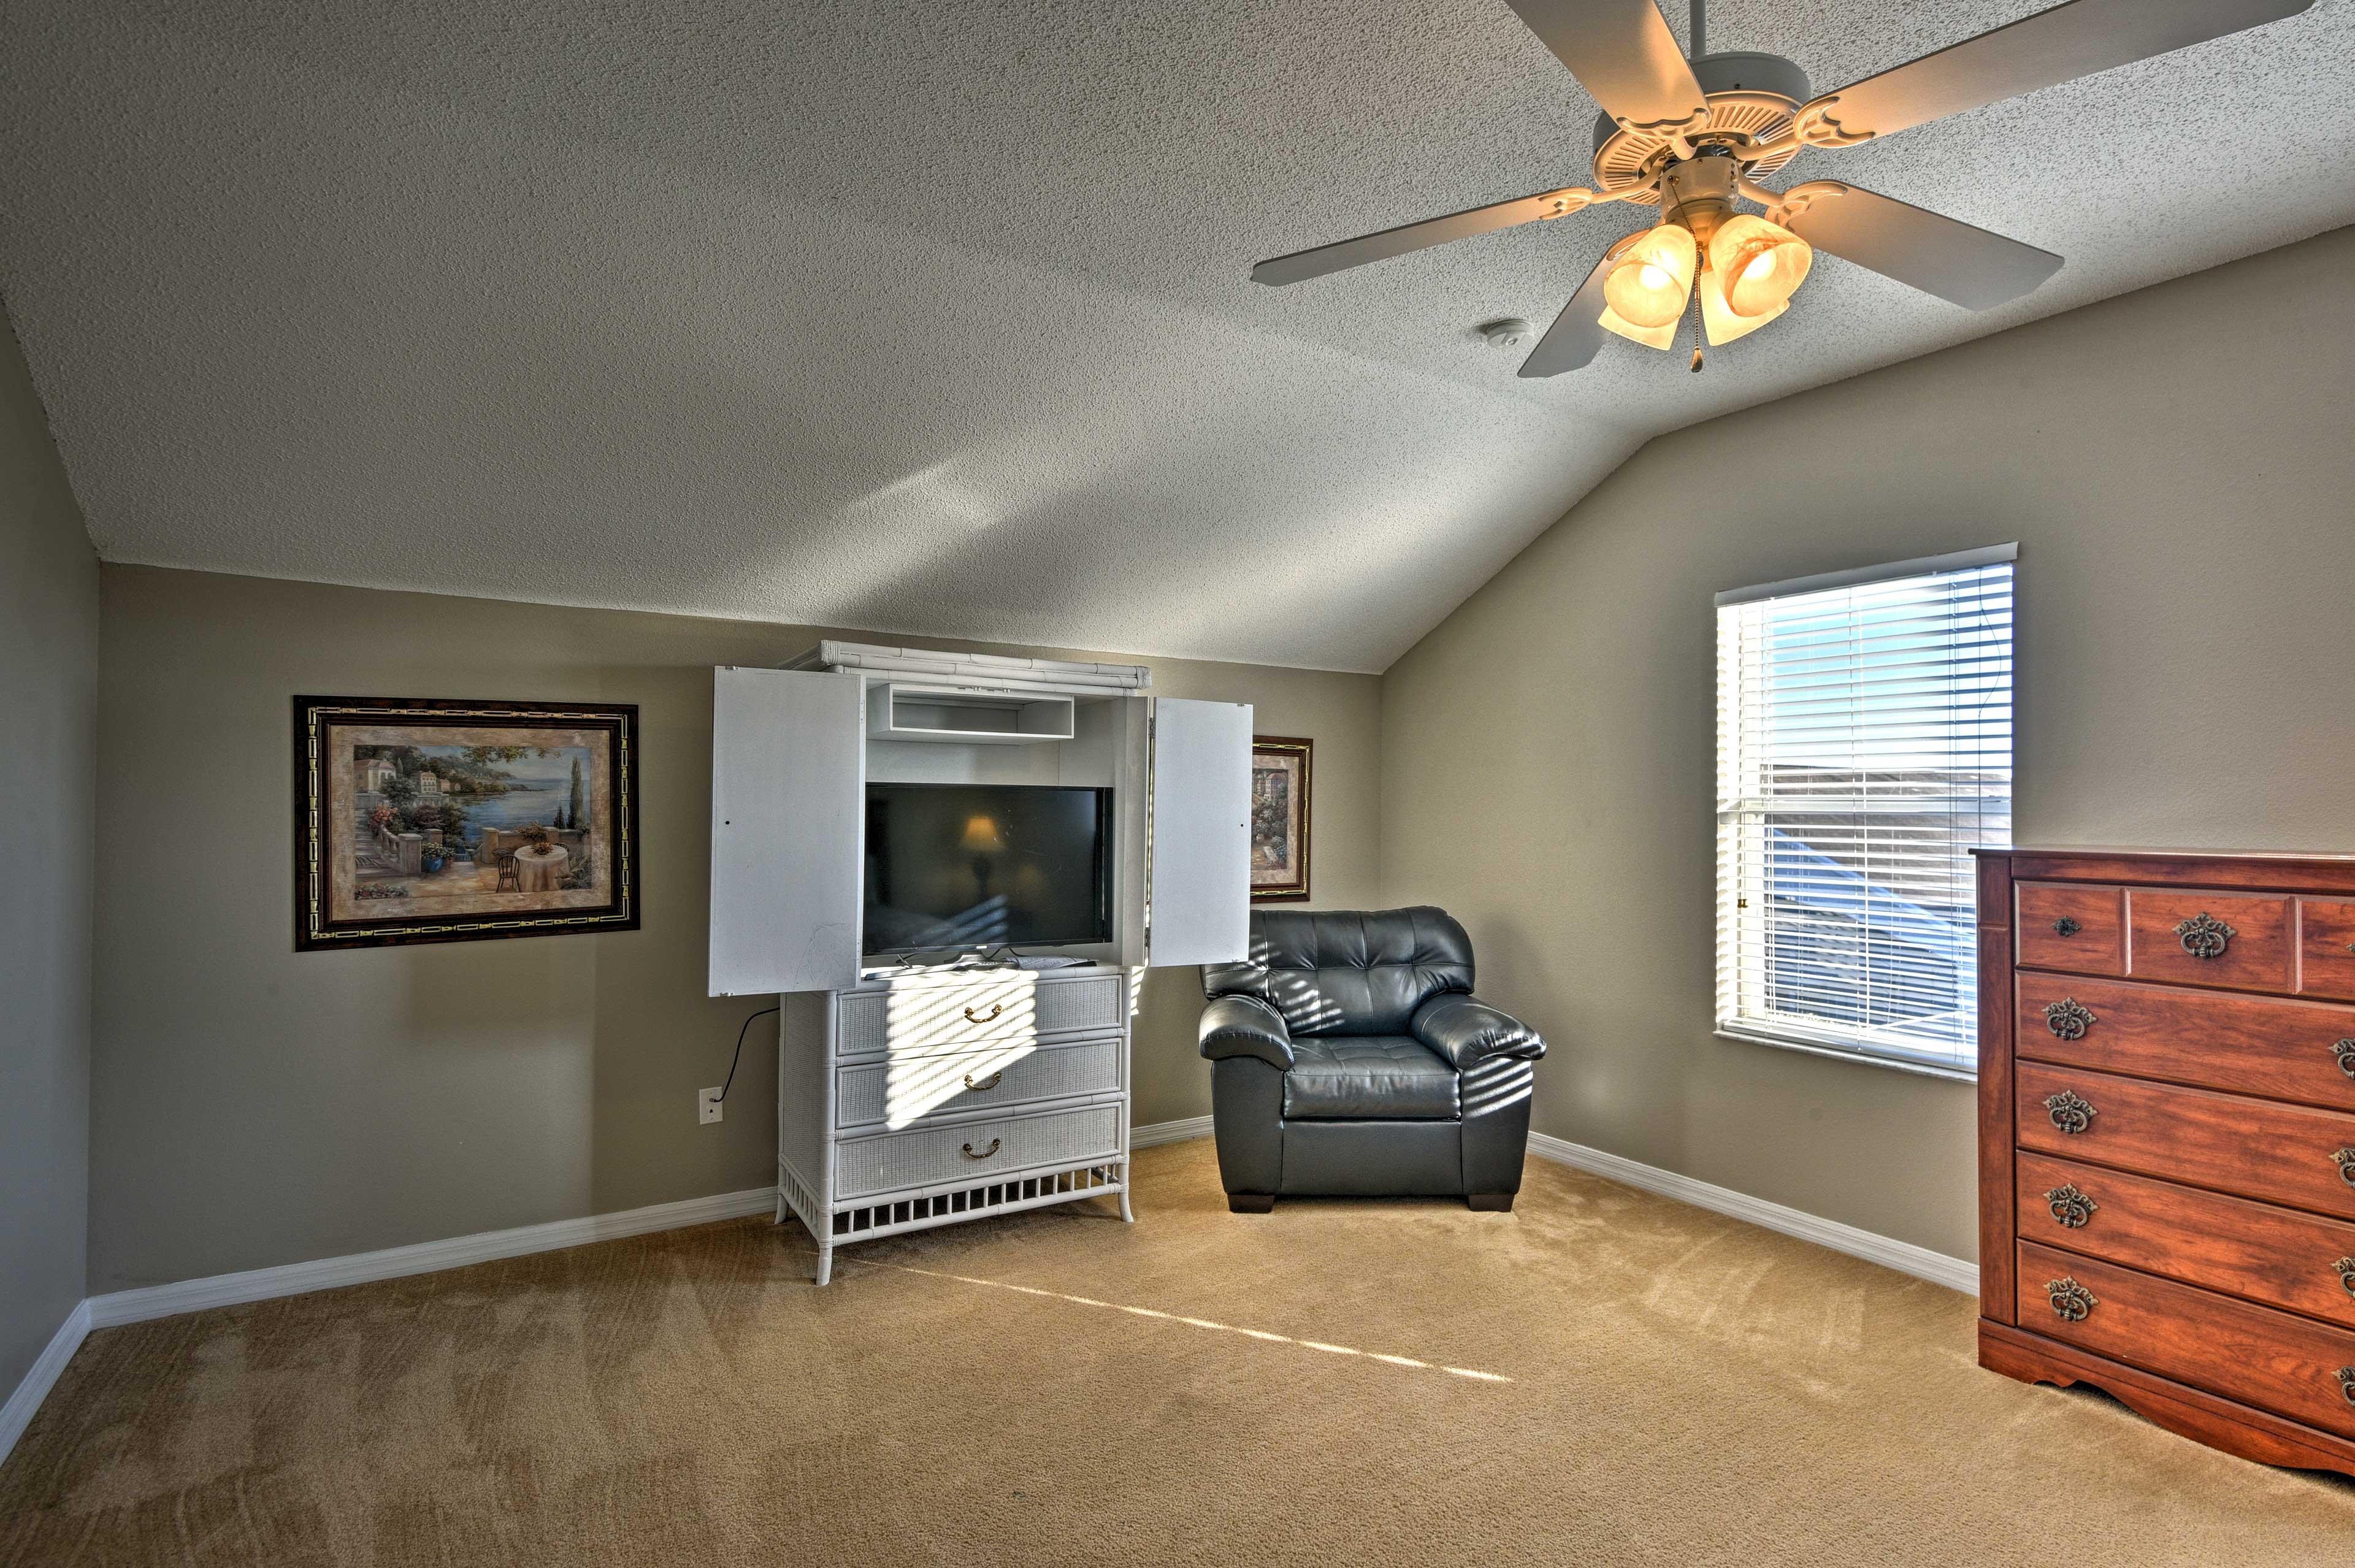 All 5 bedrooms include flat-screen TVs.